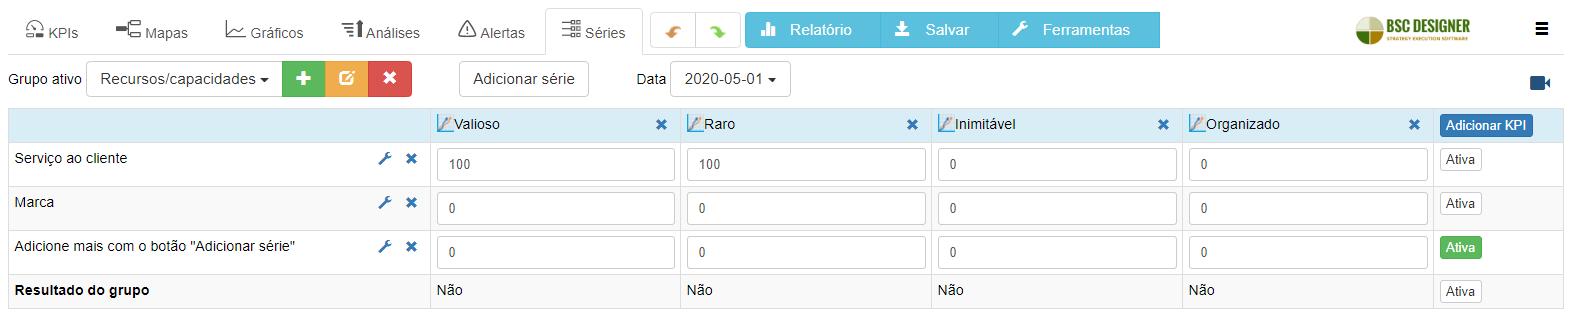 Exemplo de análise VRIO no BSC Designer Online